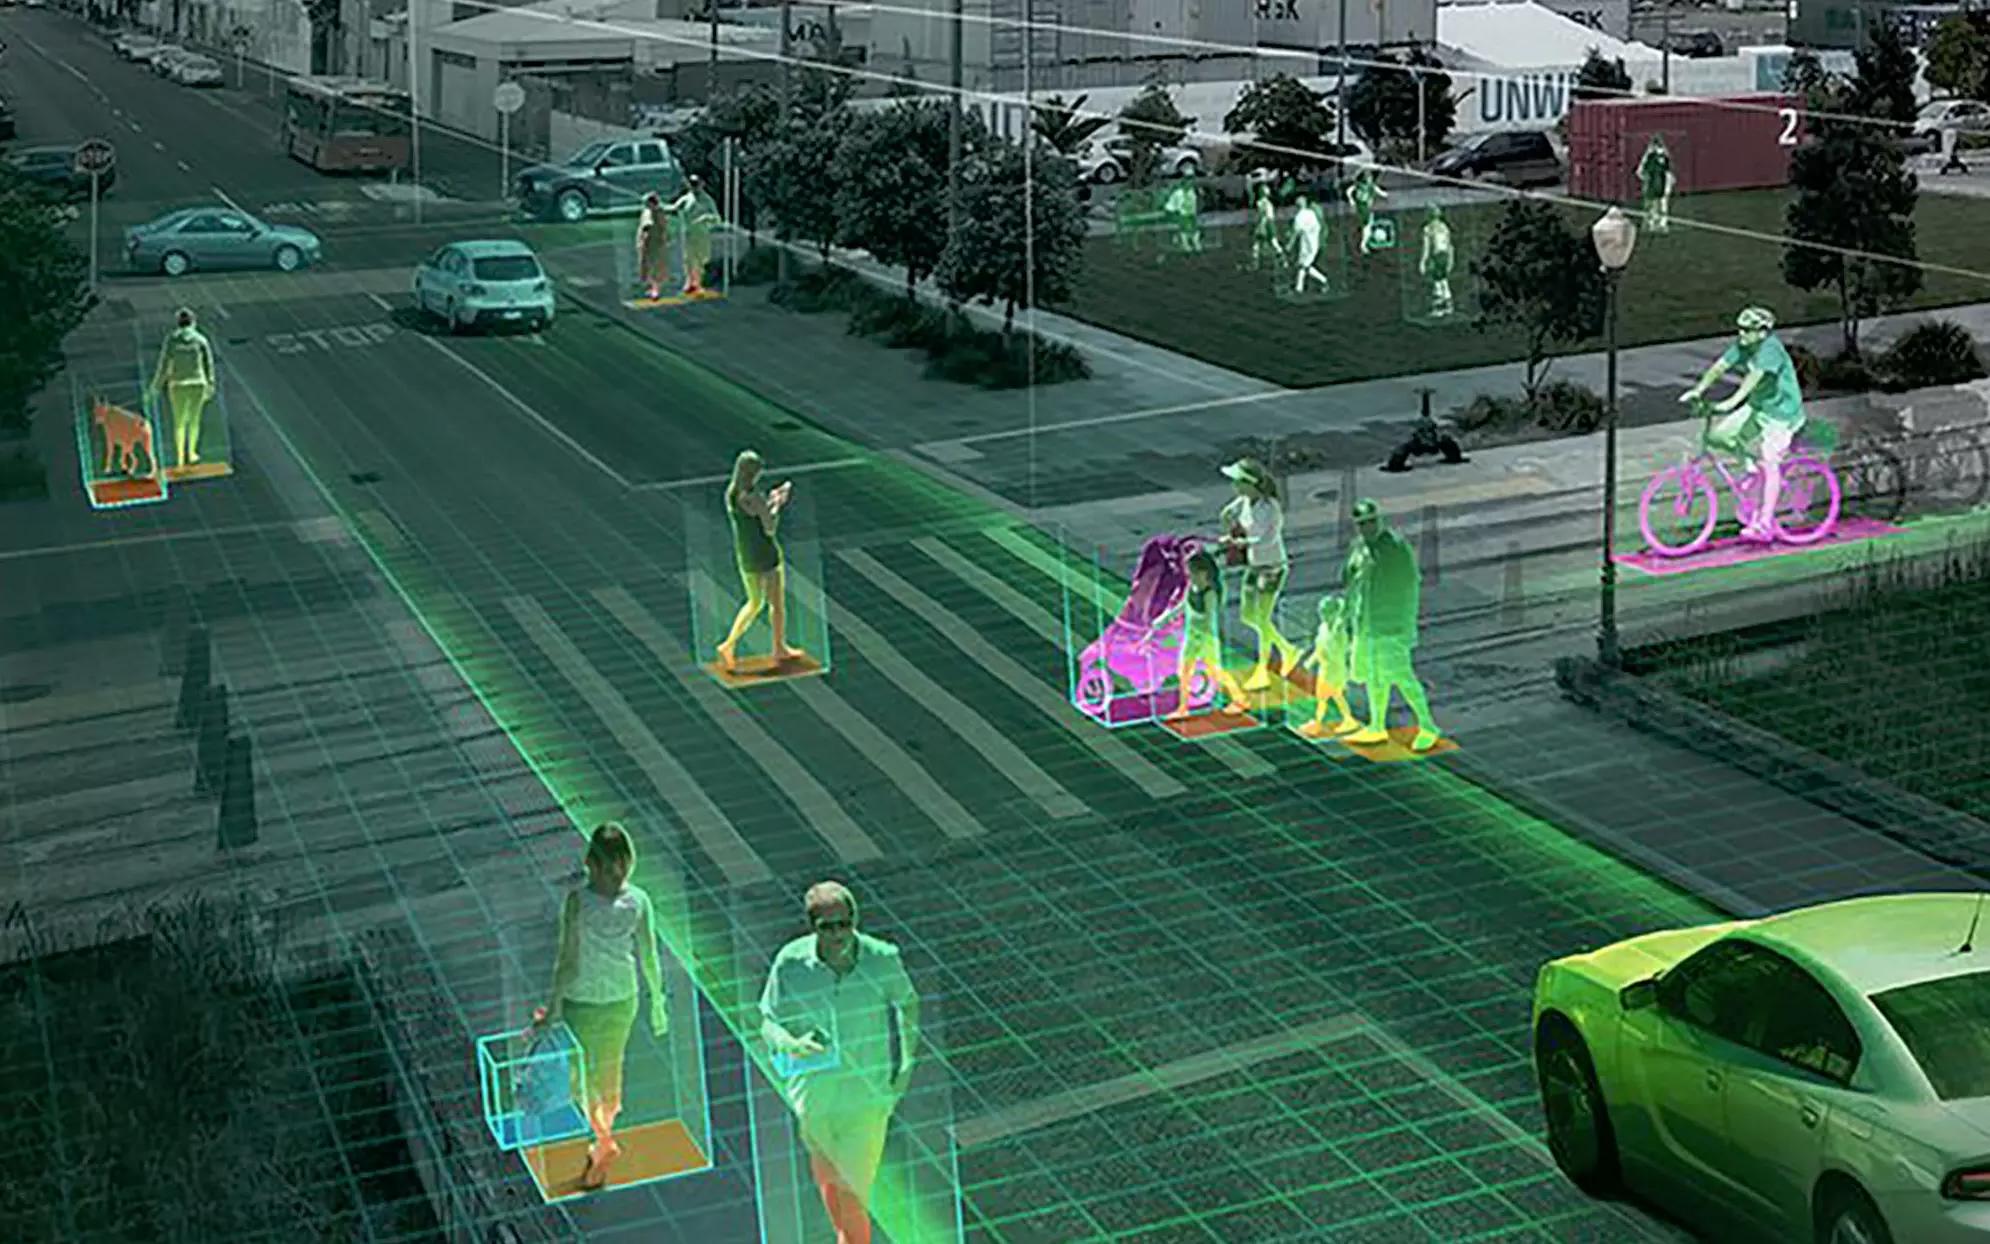 Future Trends – Terrifying Smart Cities